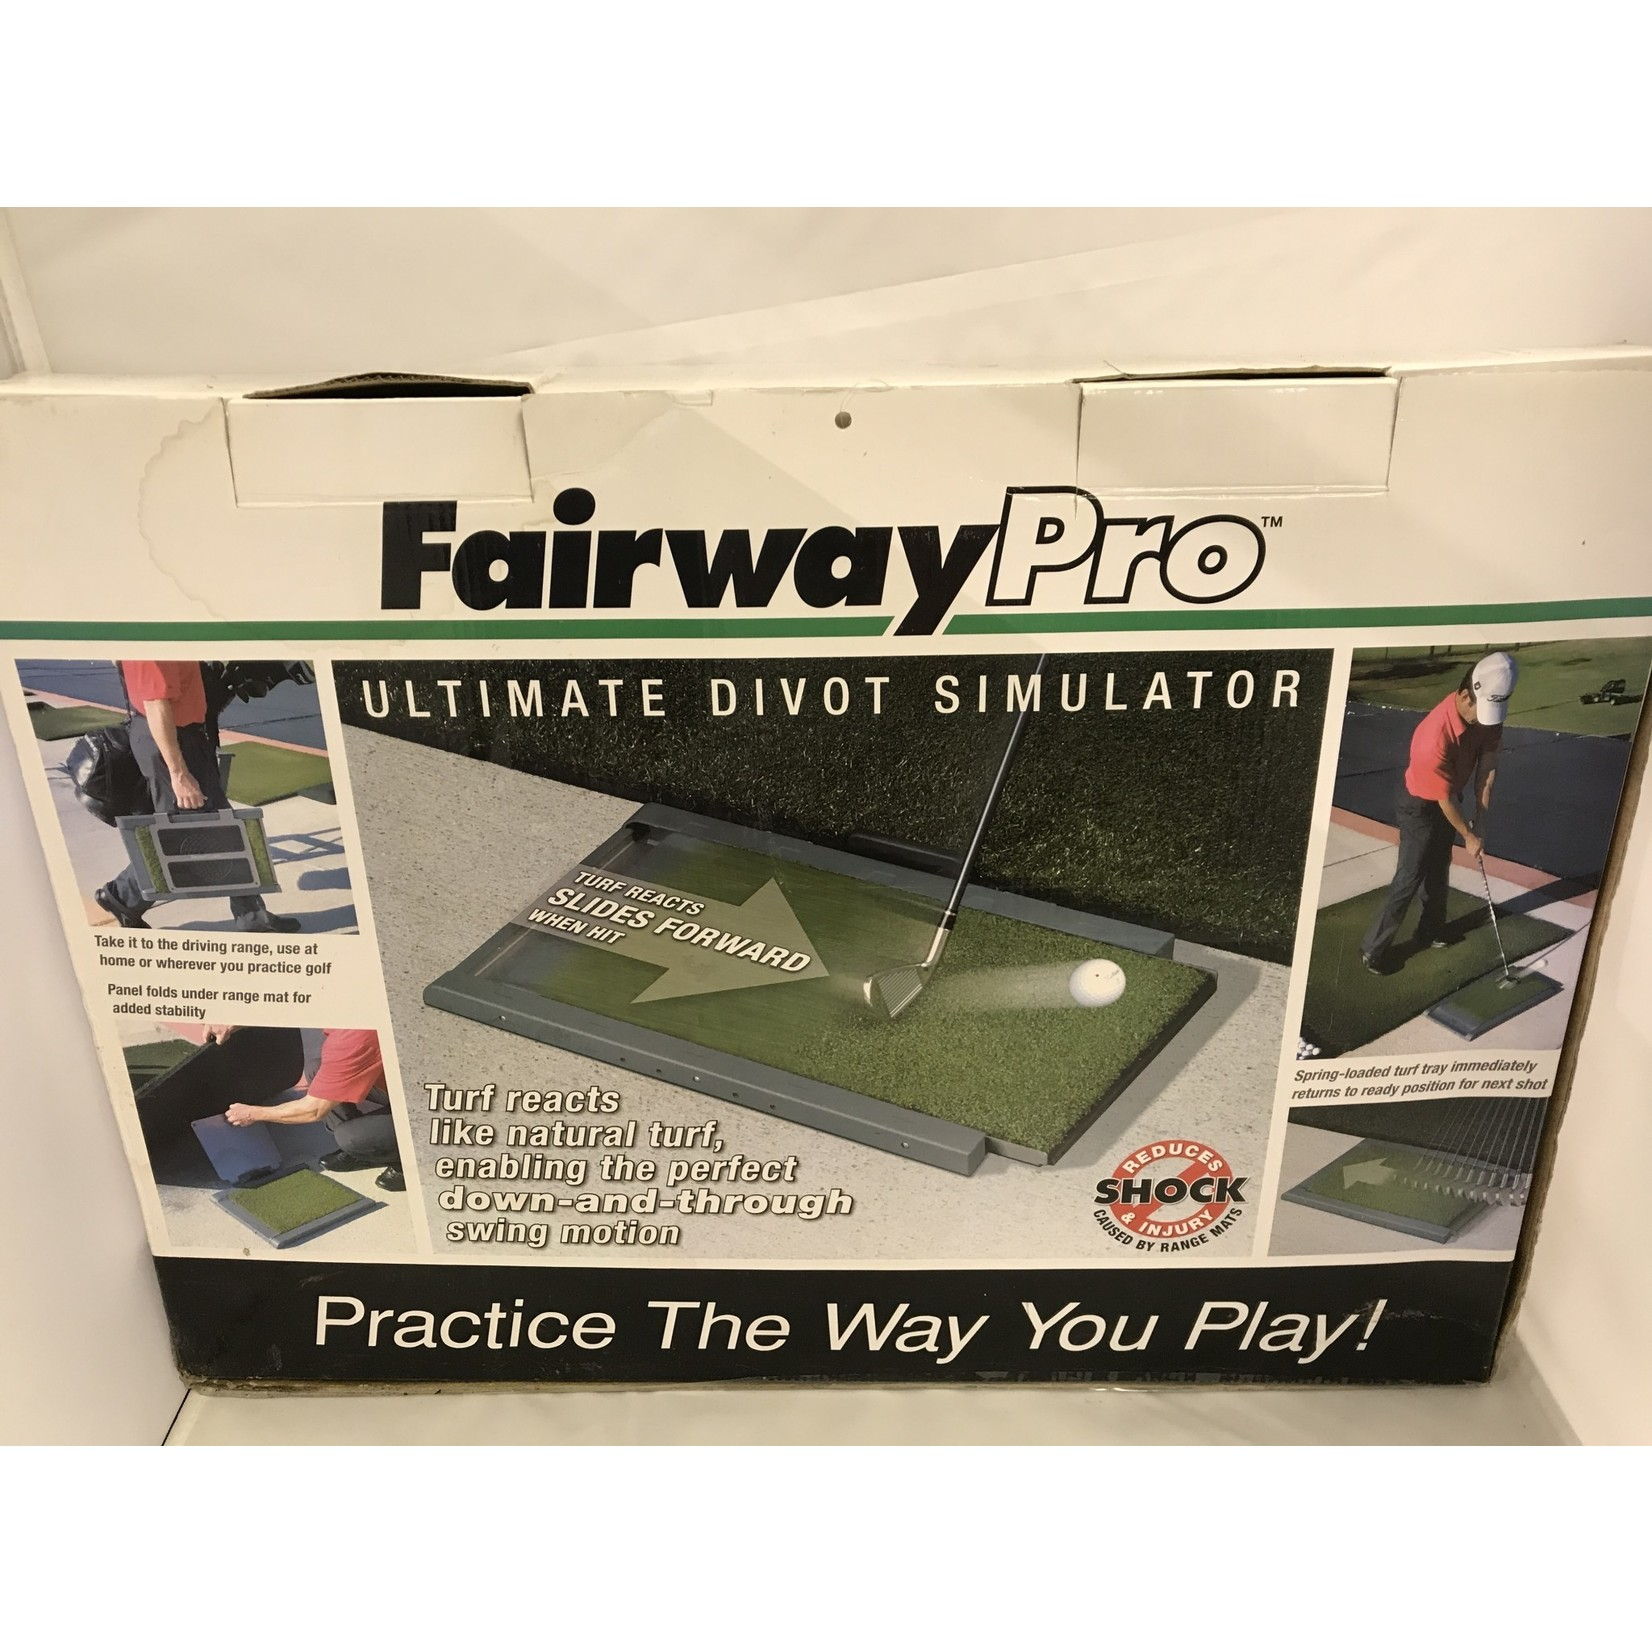 Fairway Pro Fairway Pro Simulator